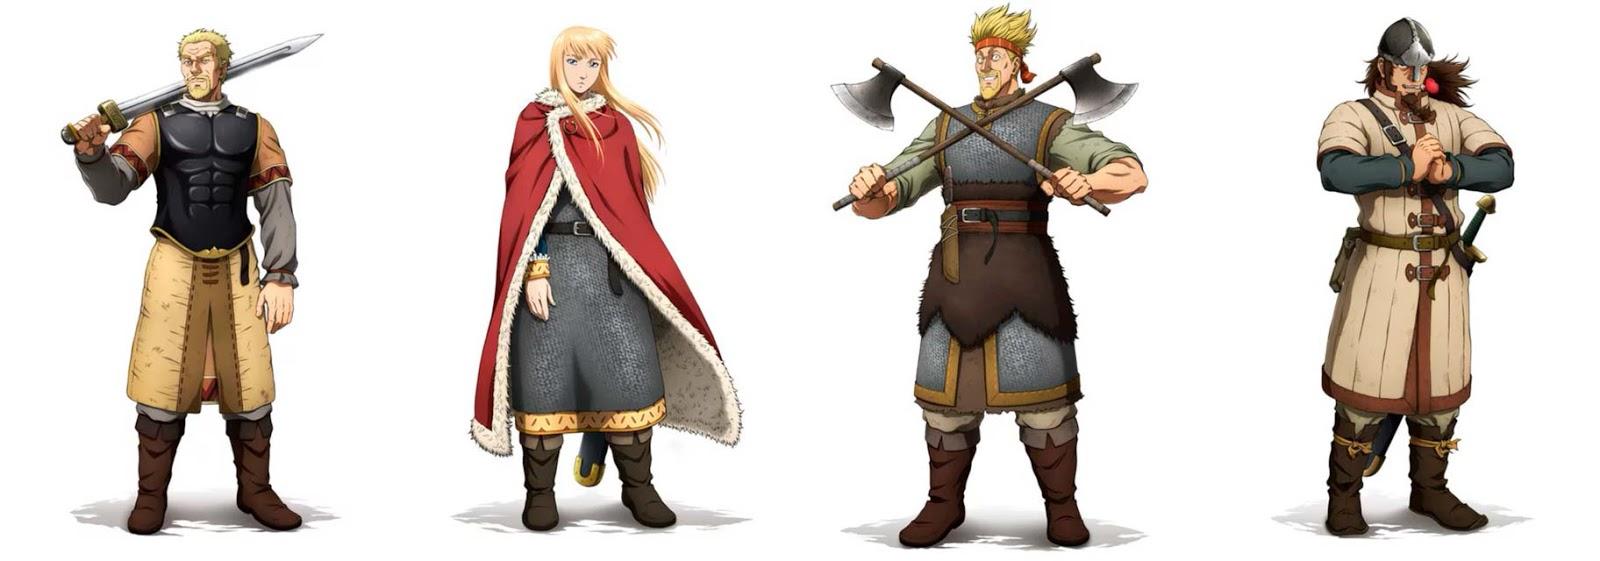 Vinland Saga anime - personajes